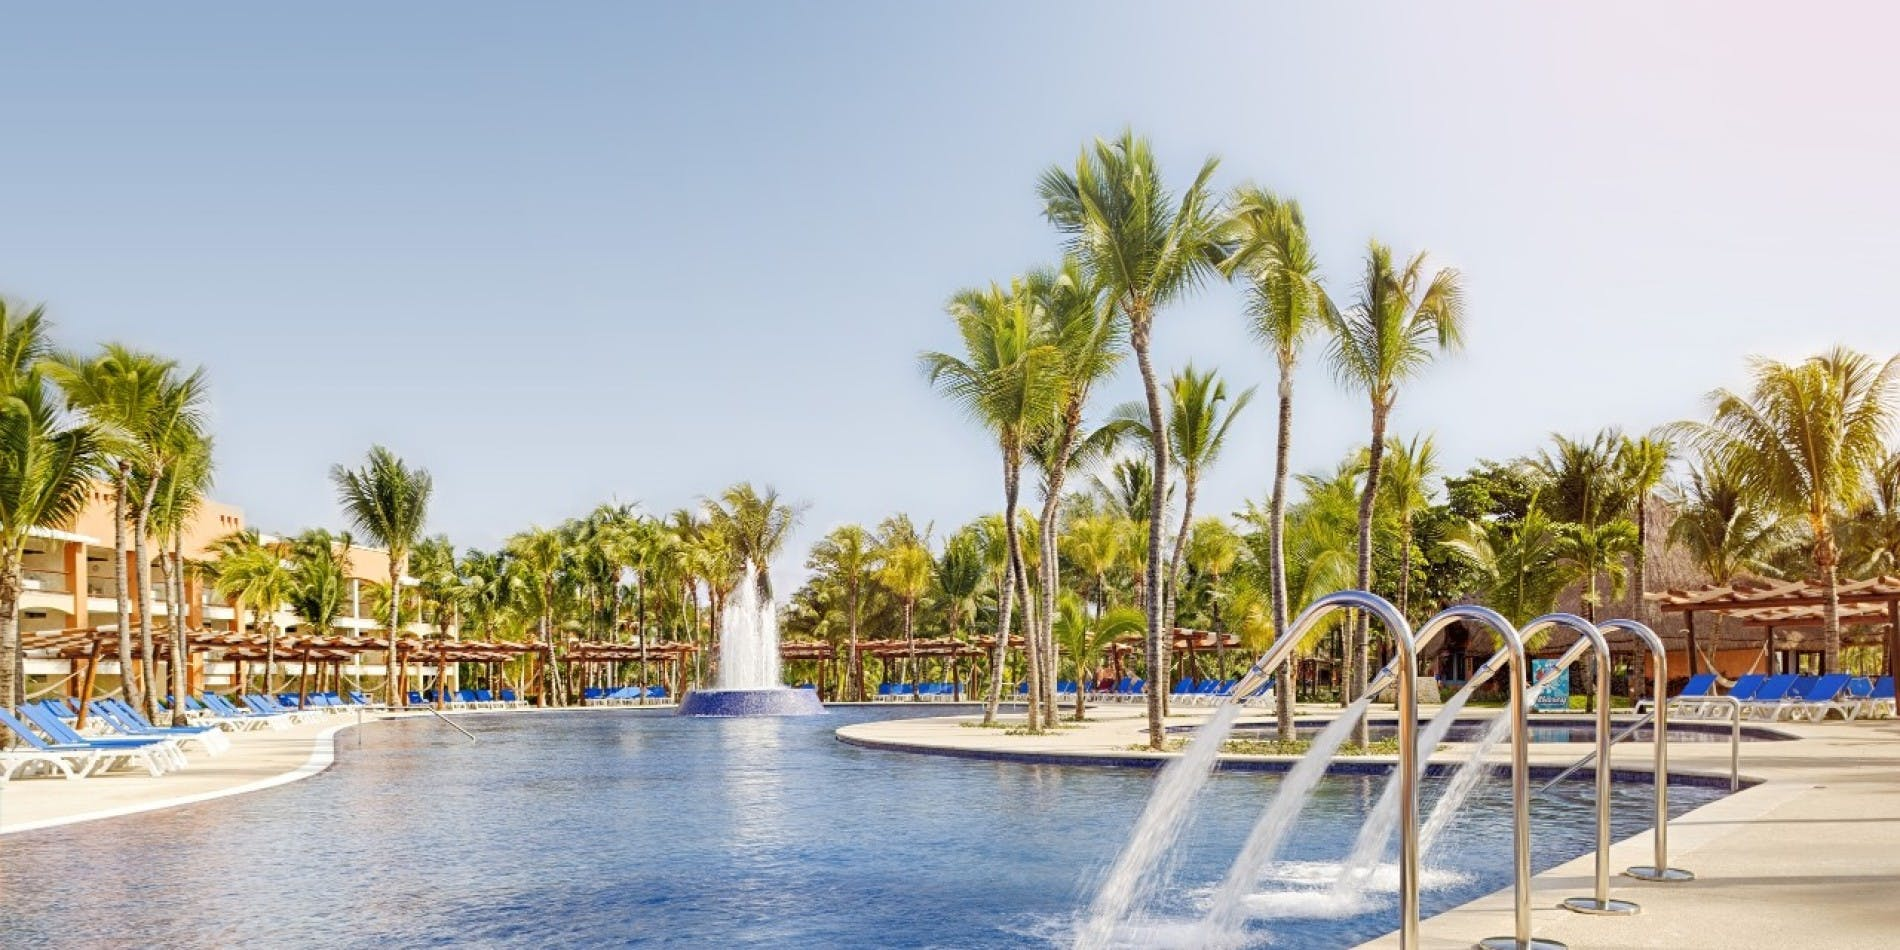 barcelo maya beach pool